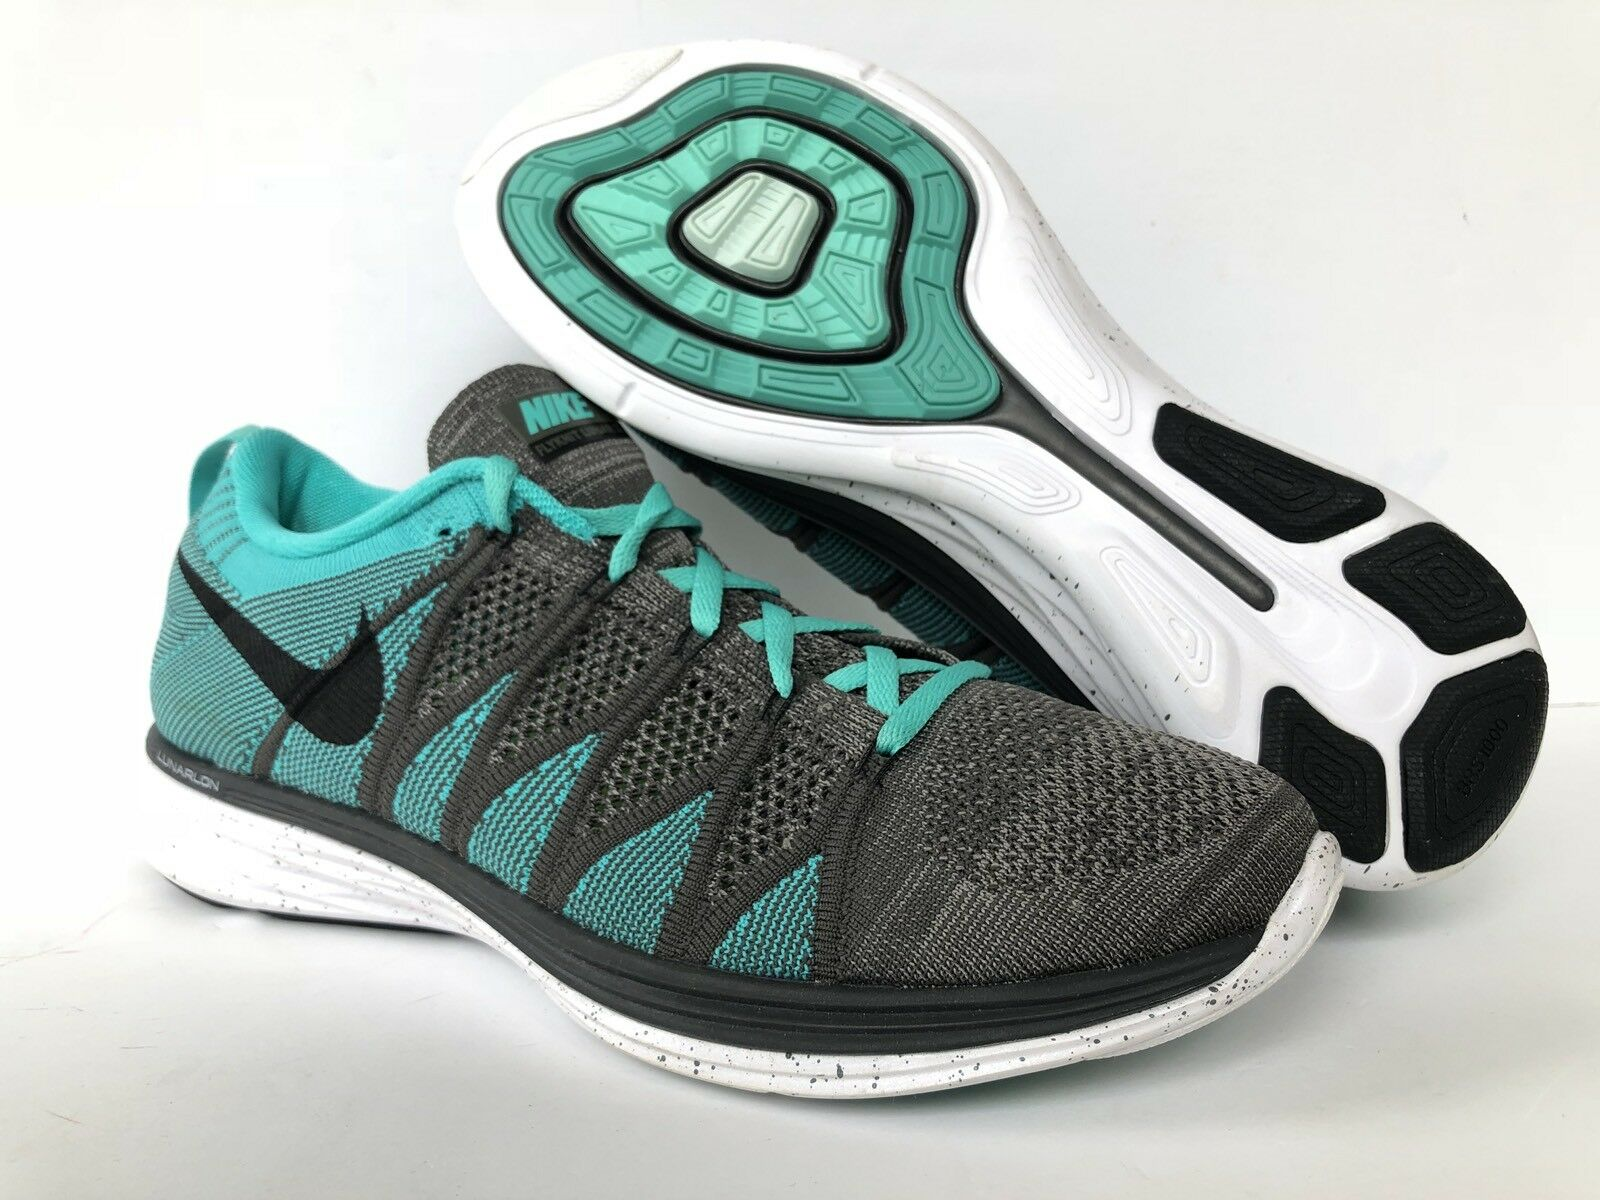 Nike campione flyknit lunar 2 noi uomini sz 10 [620465-003] till / grey